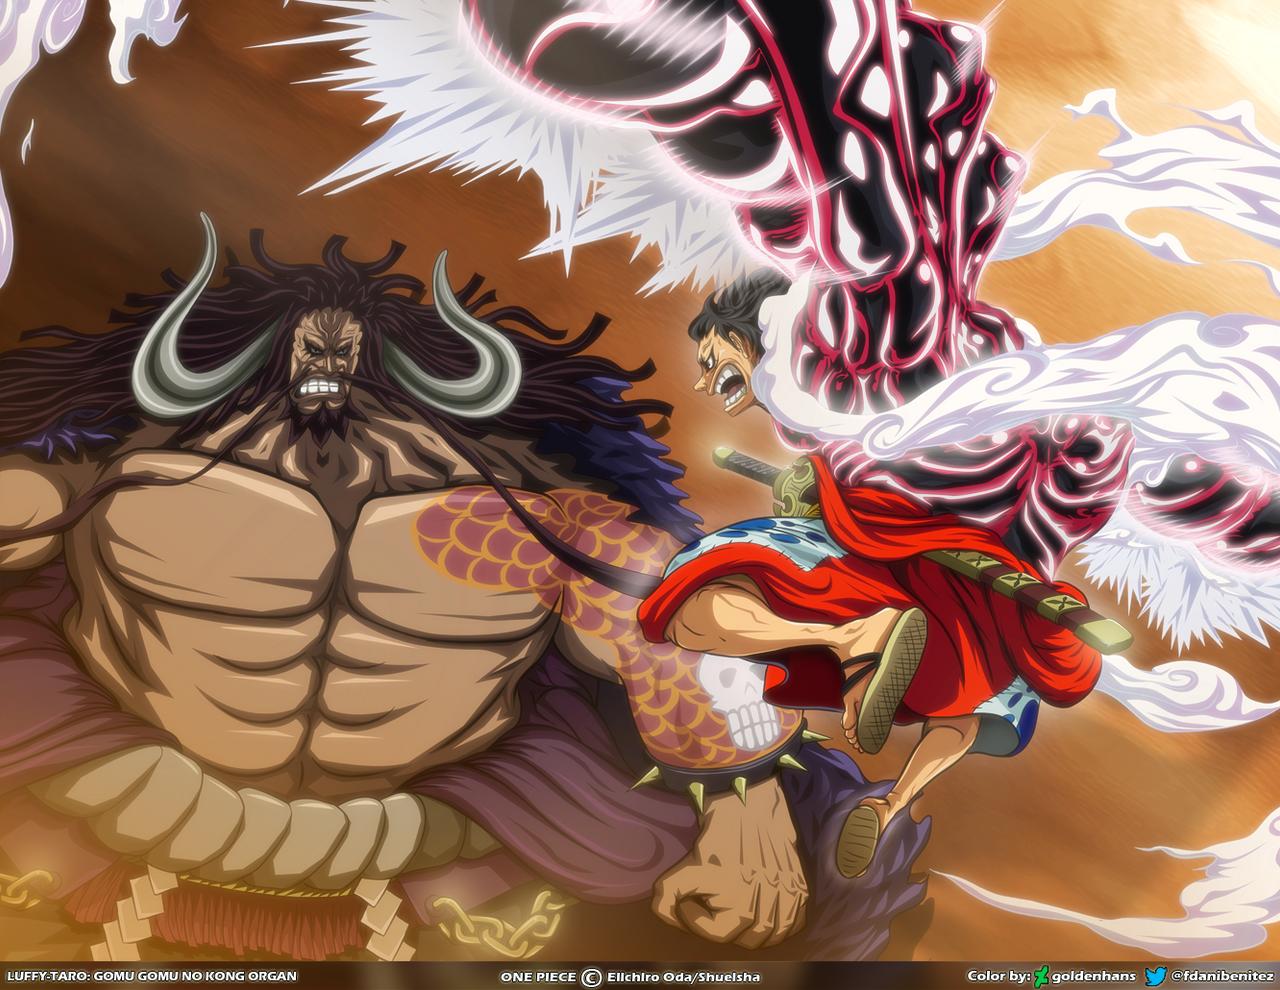 Wallpaper Kaido And Luffy By Goldenhans On Deviantart